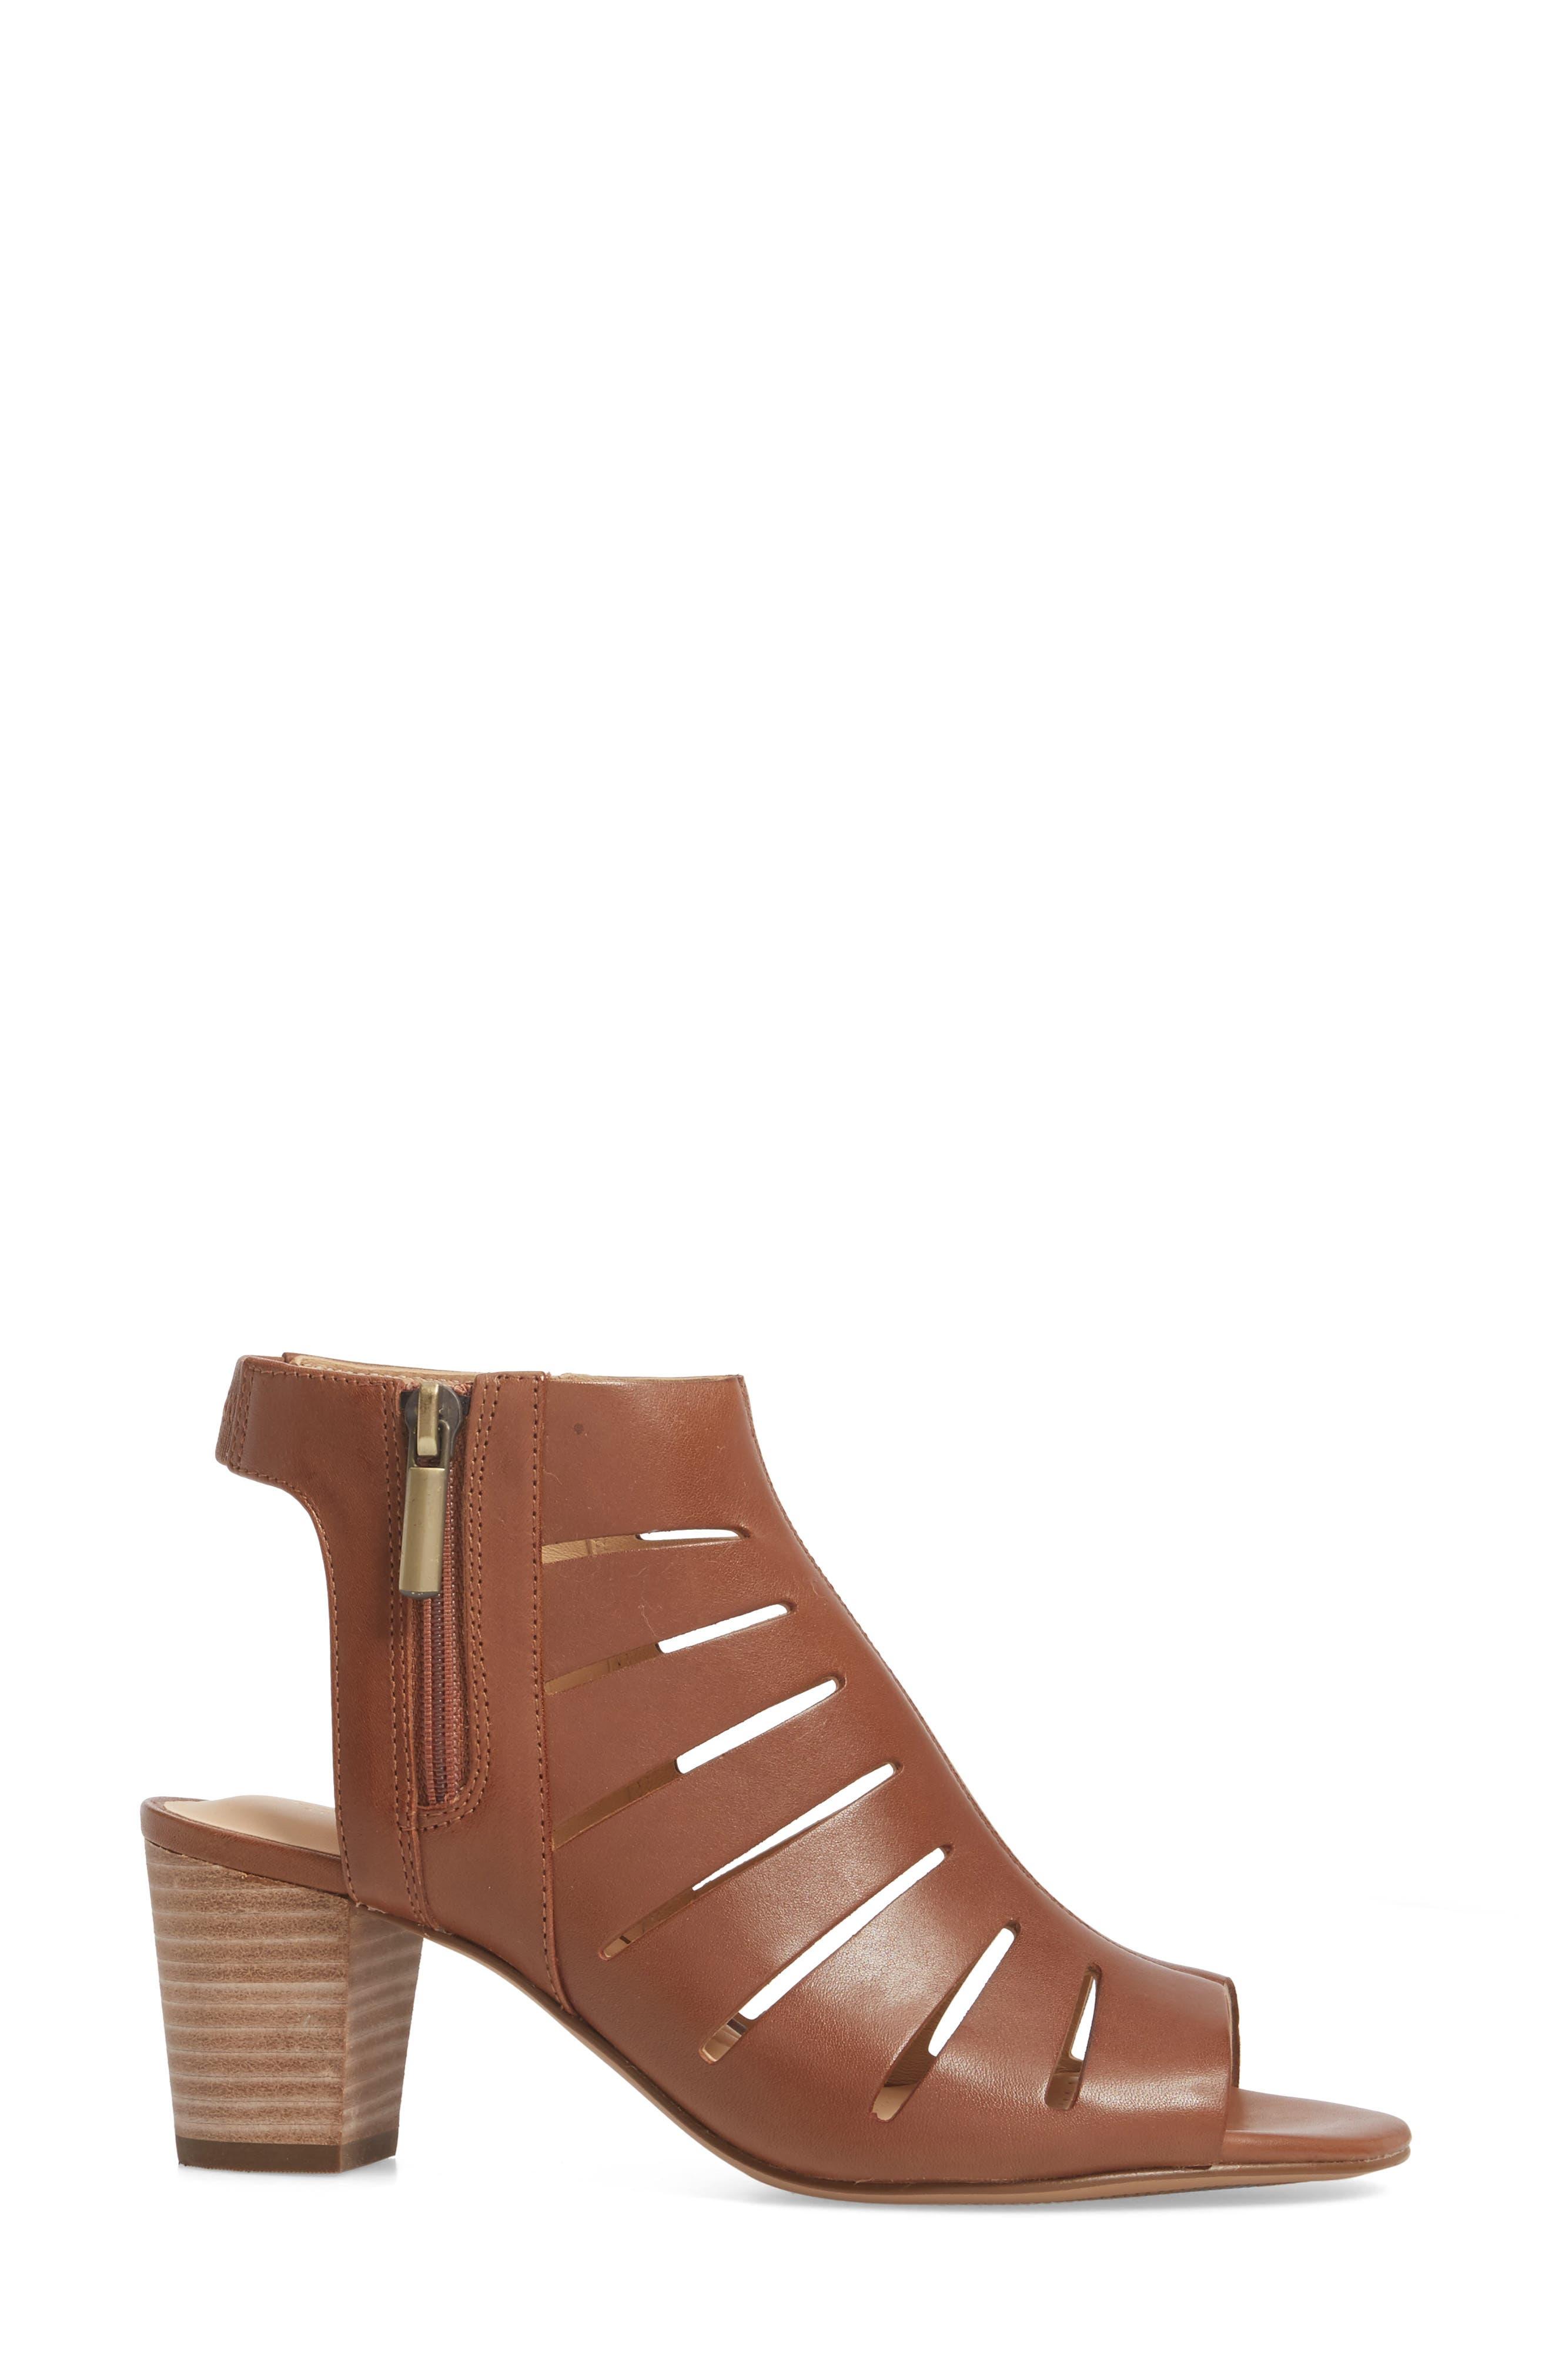 Deloria Ivy Sandal,                             Alternate thumbnail 3, color,                             Tan Leather